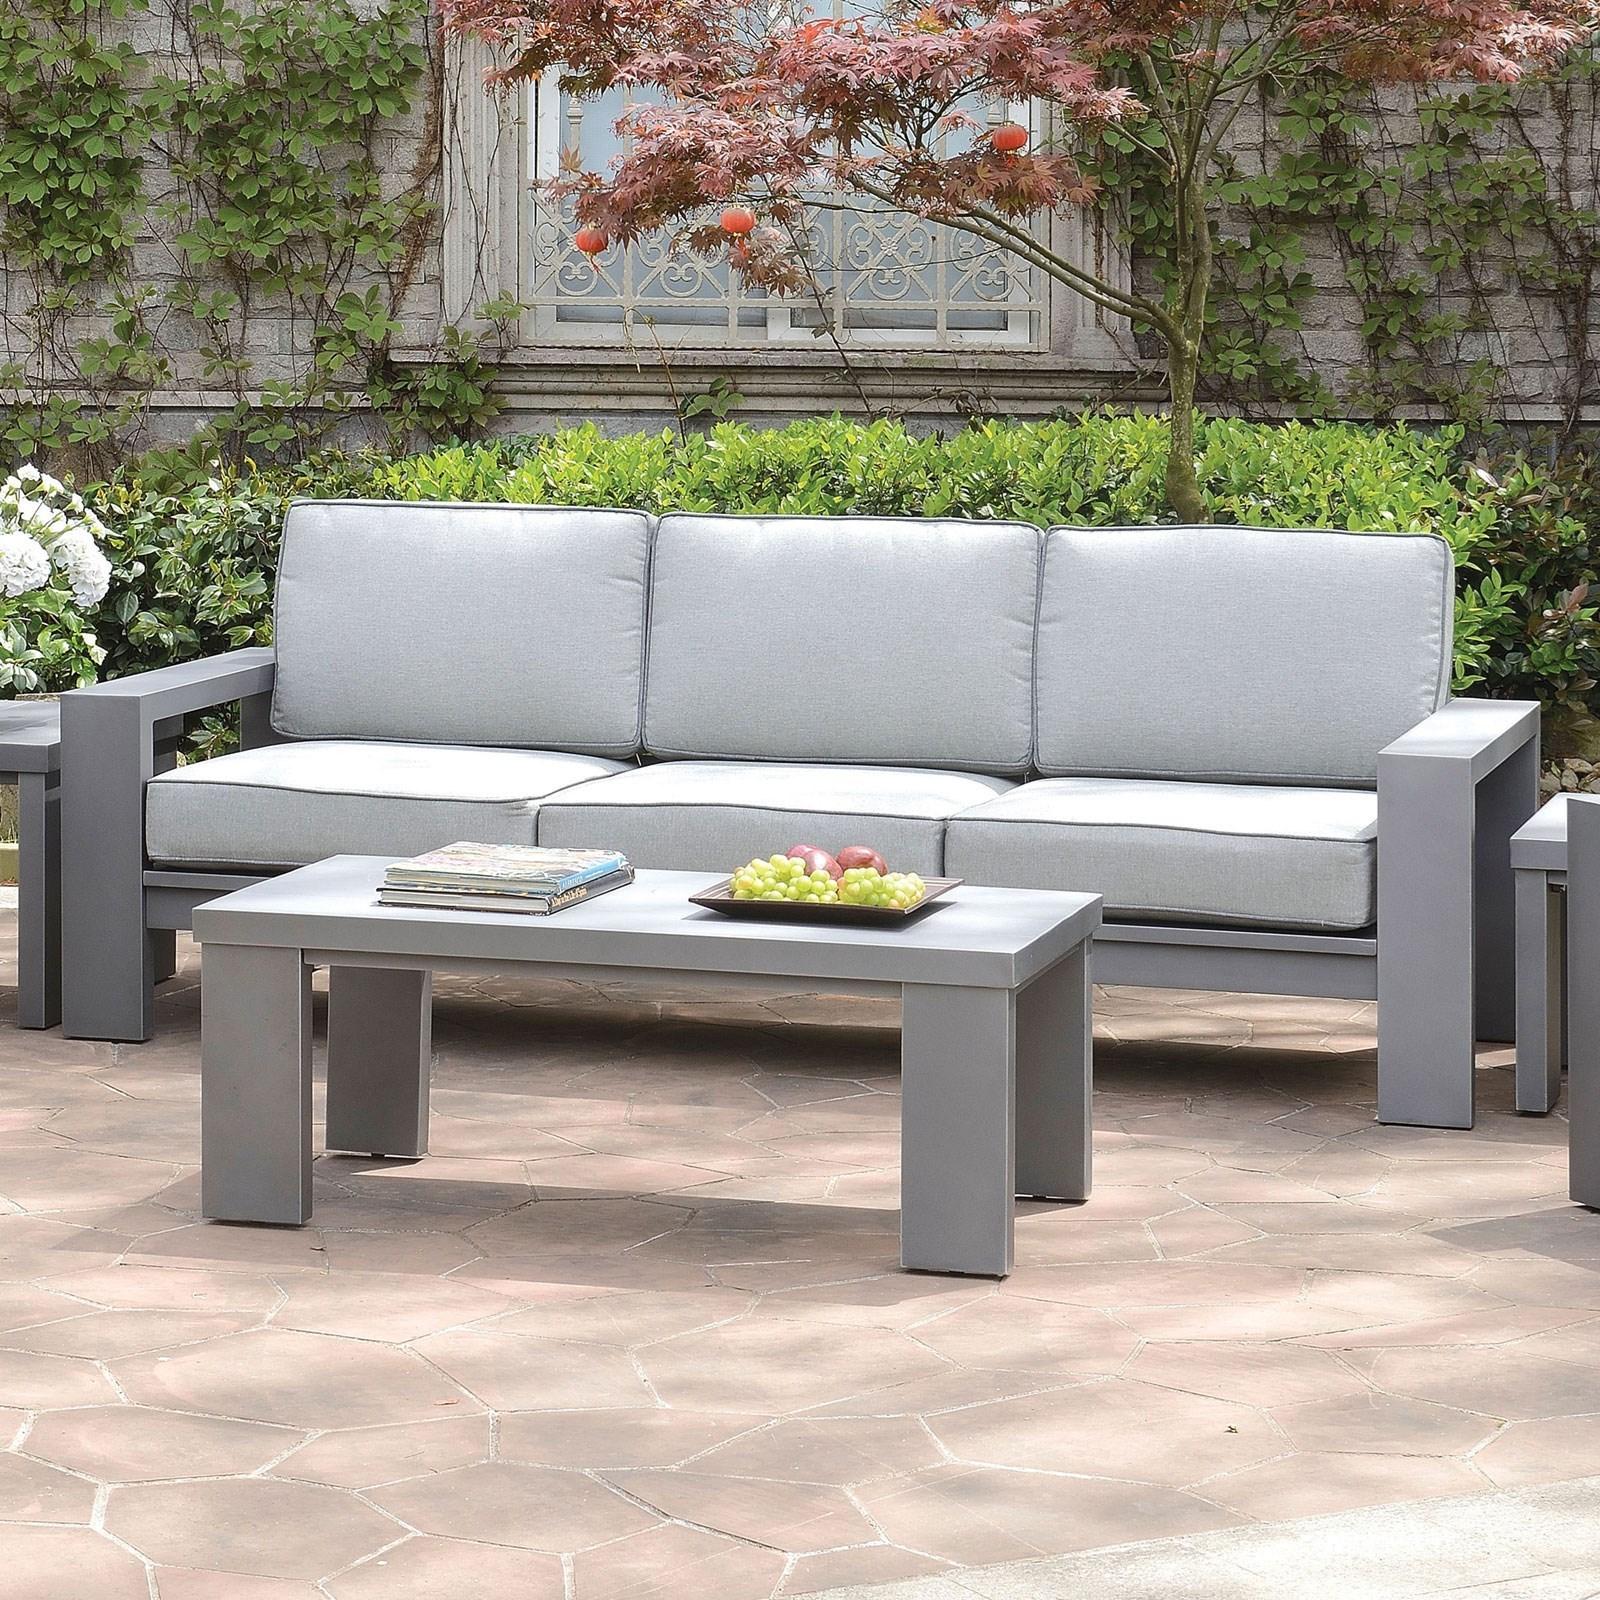 Ballyshannon Sofa at Household Furniture